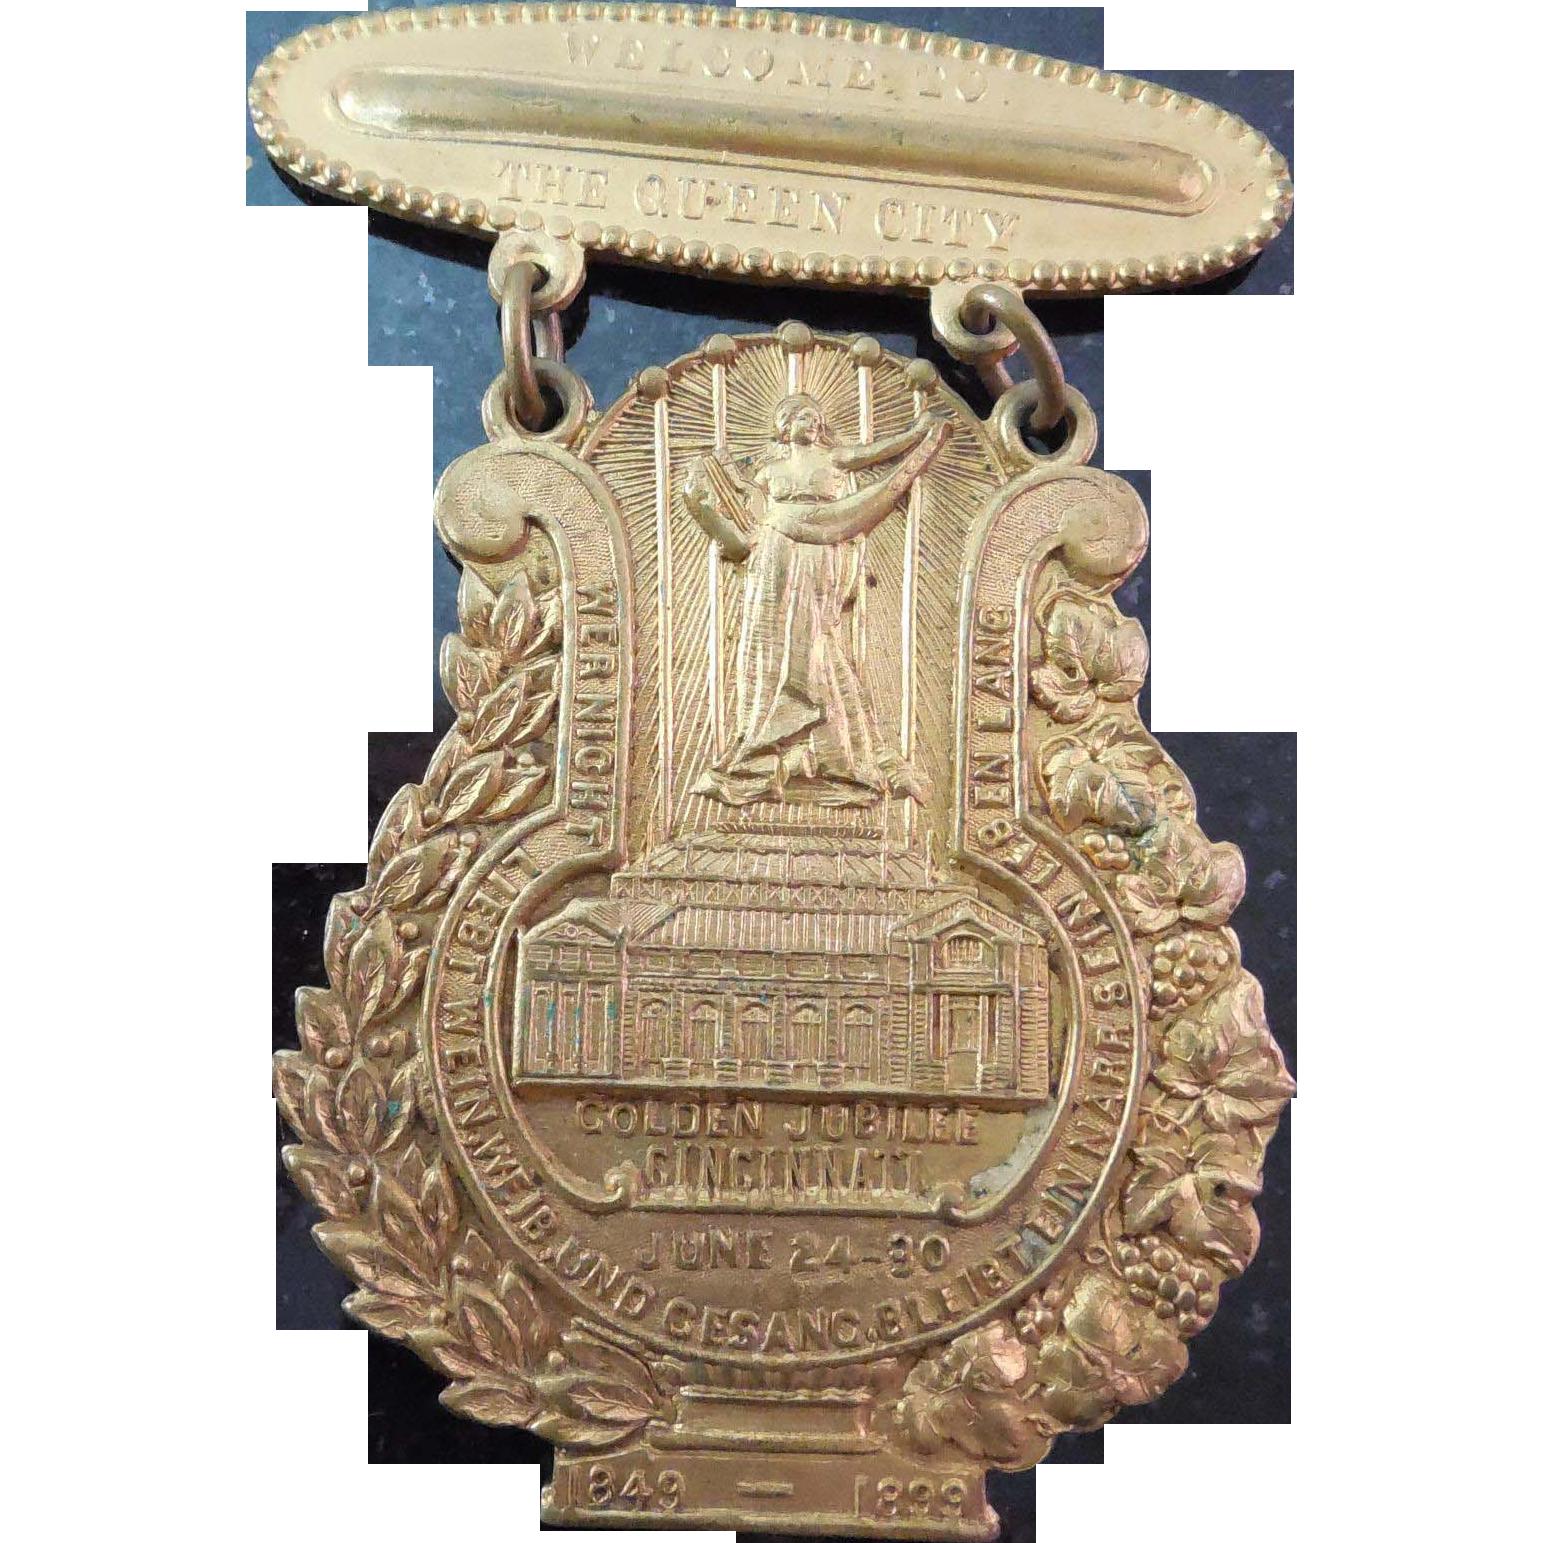 Antique Cincinnati Golden Jubilee 1849 1899 Commemorative Badge or Medal